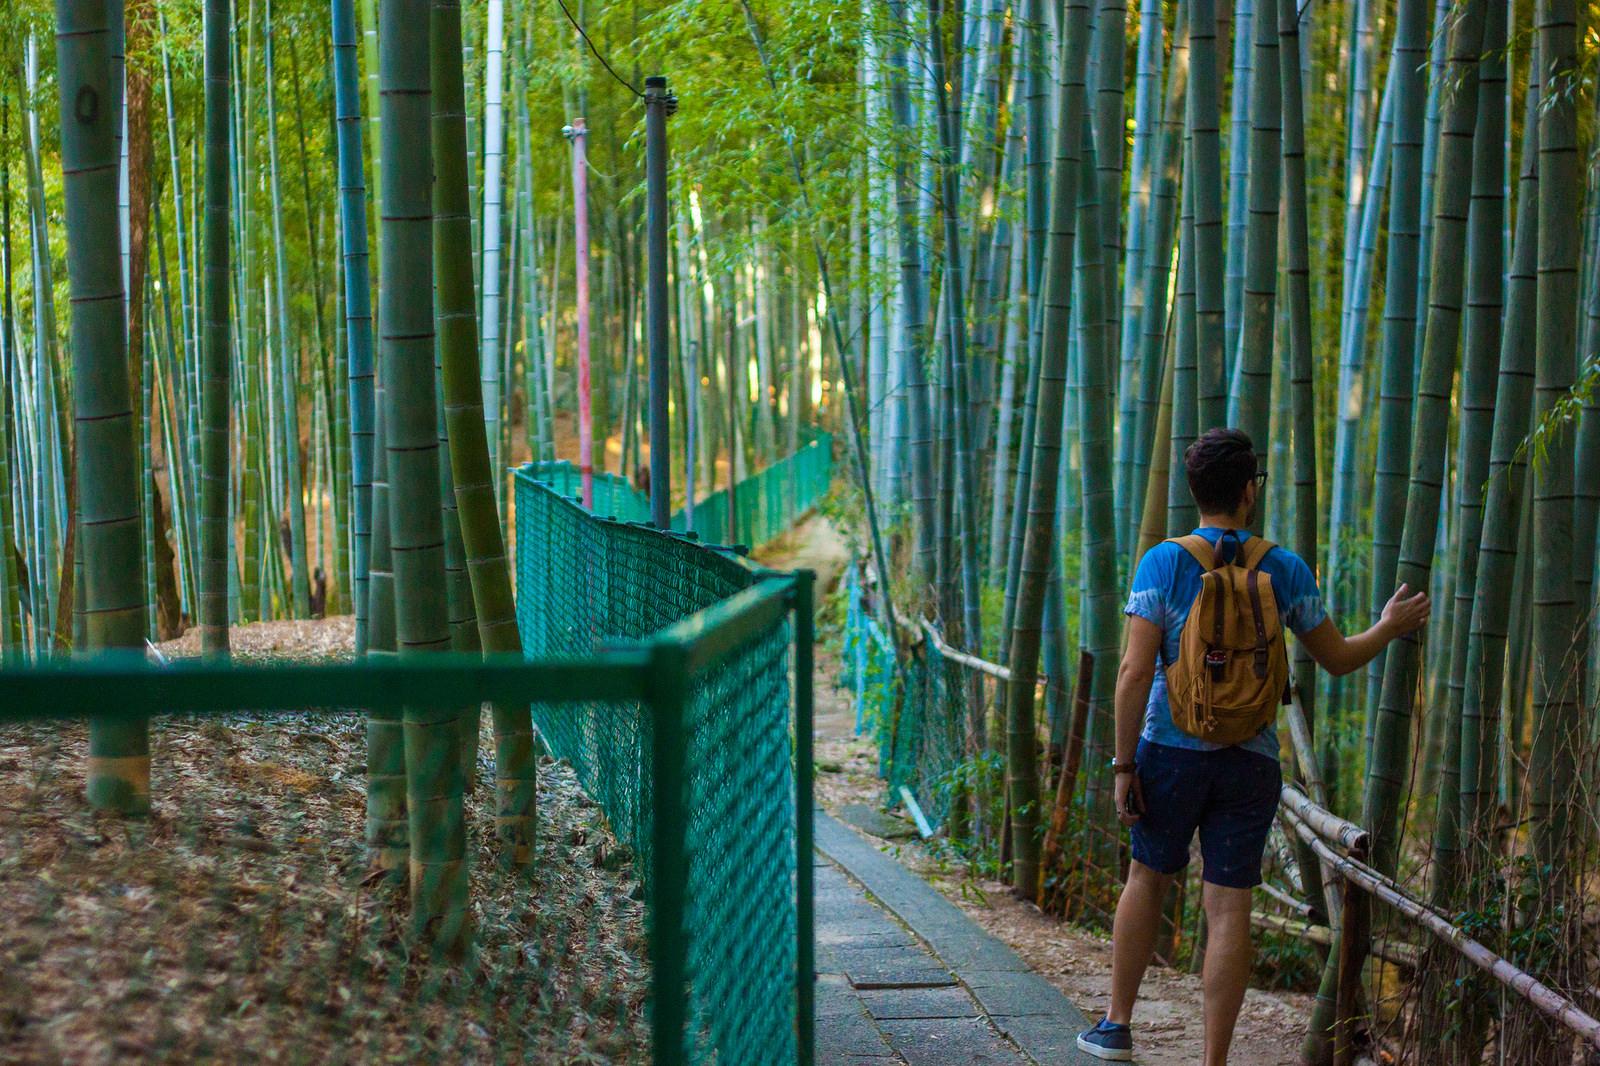 30372611765_03b2fe2ee9_h.jpgThe Ultimate Walking Tour of Kyoto's Incredible Fushimi Inari Shrine's 10,000 torii gates